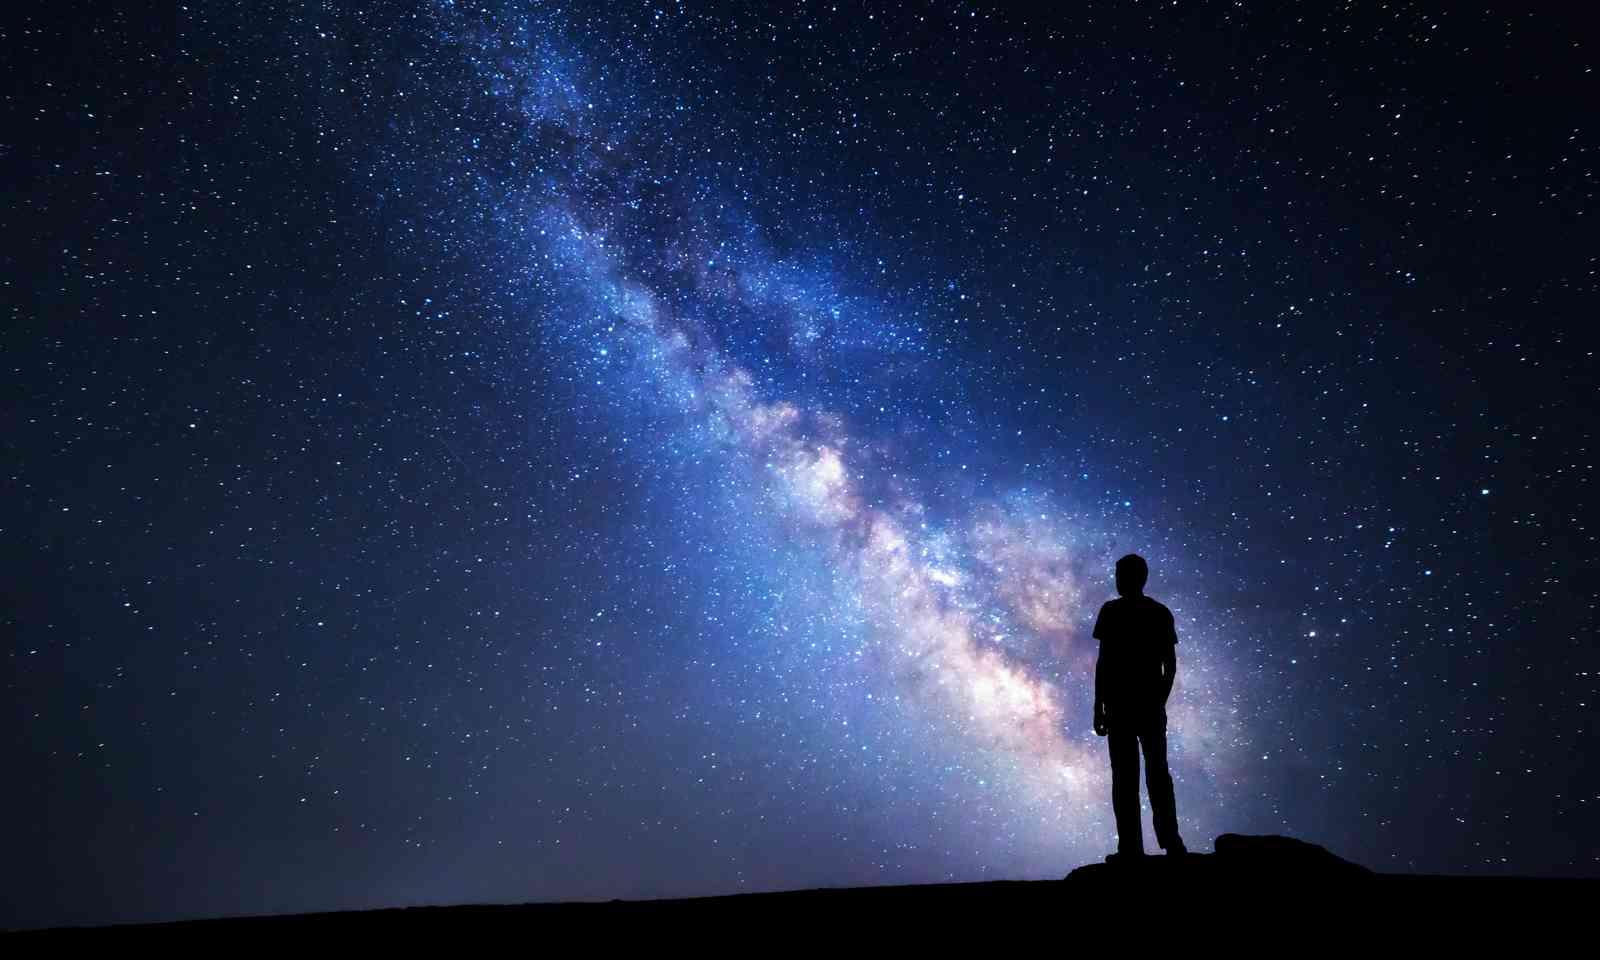 Milky Way (Dreamstime)